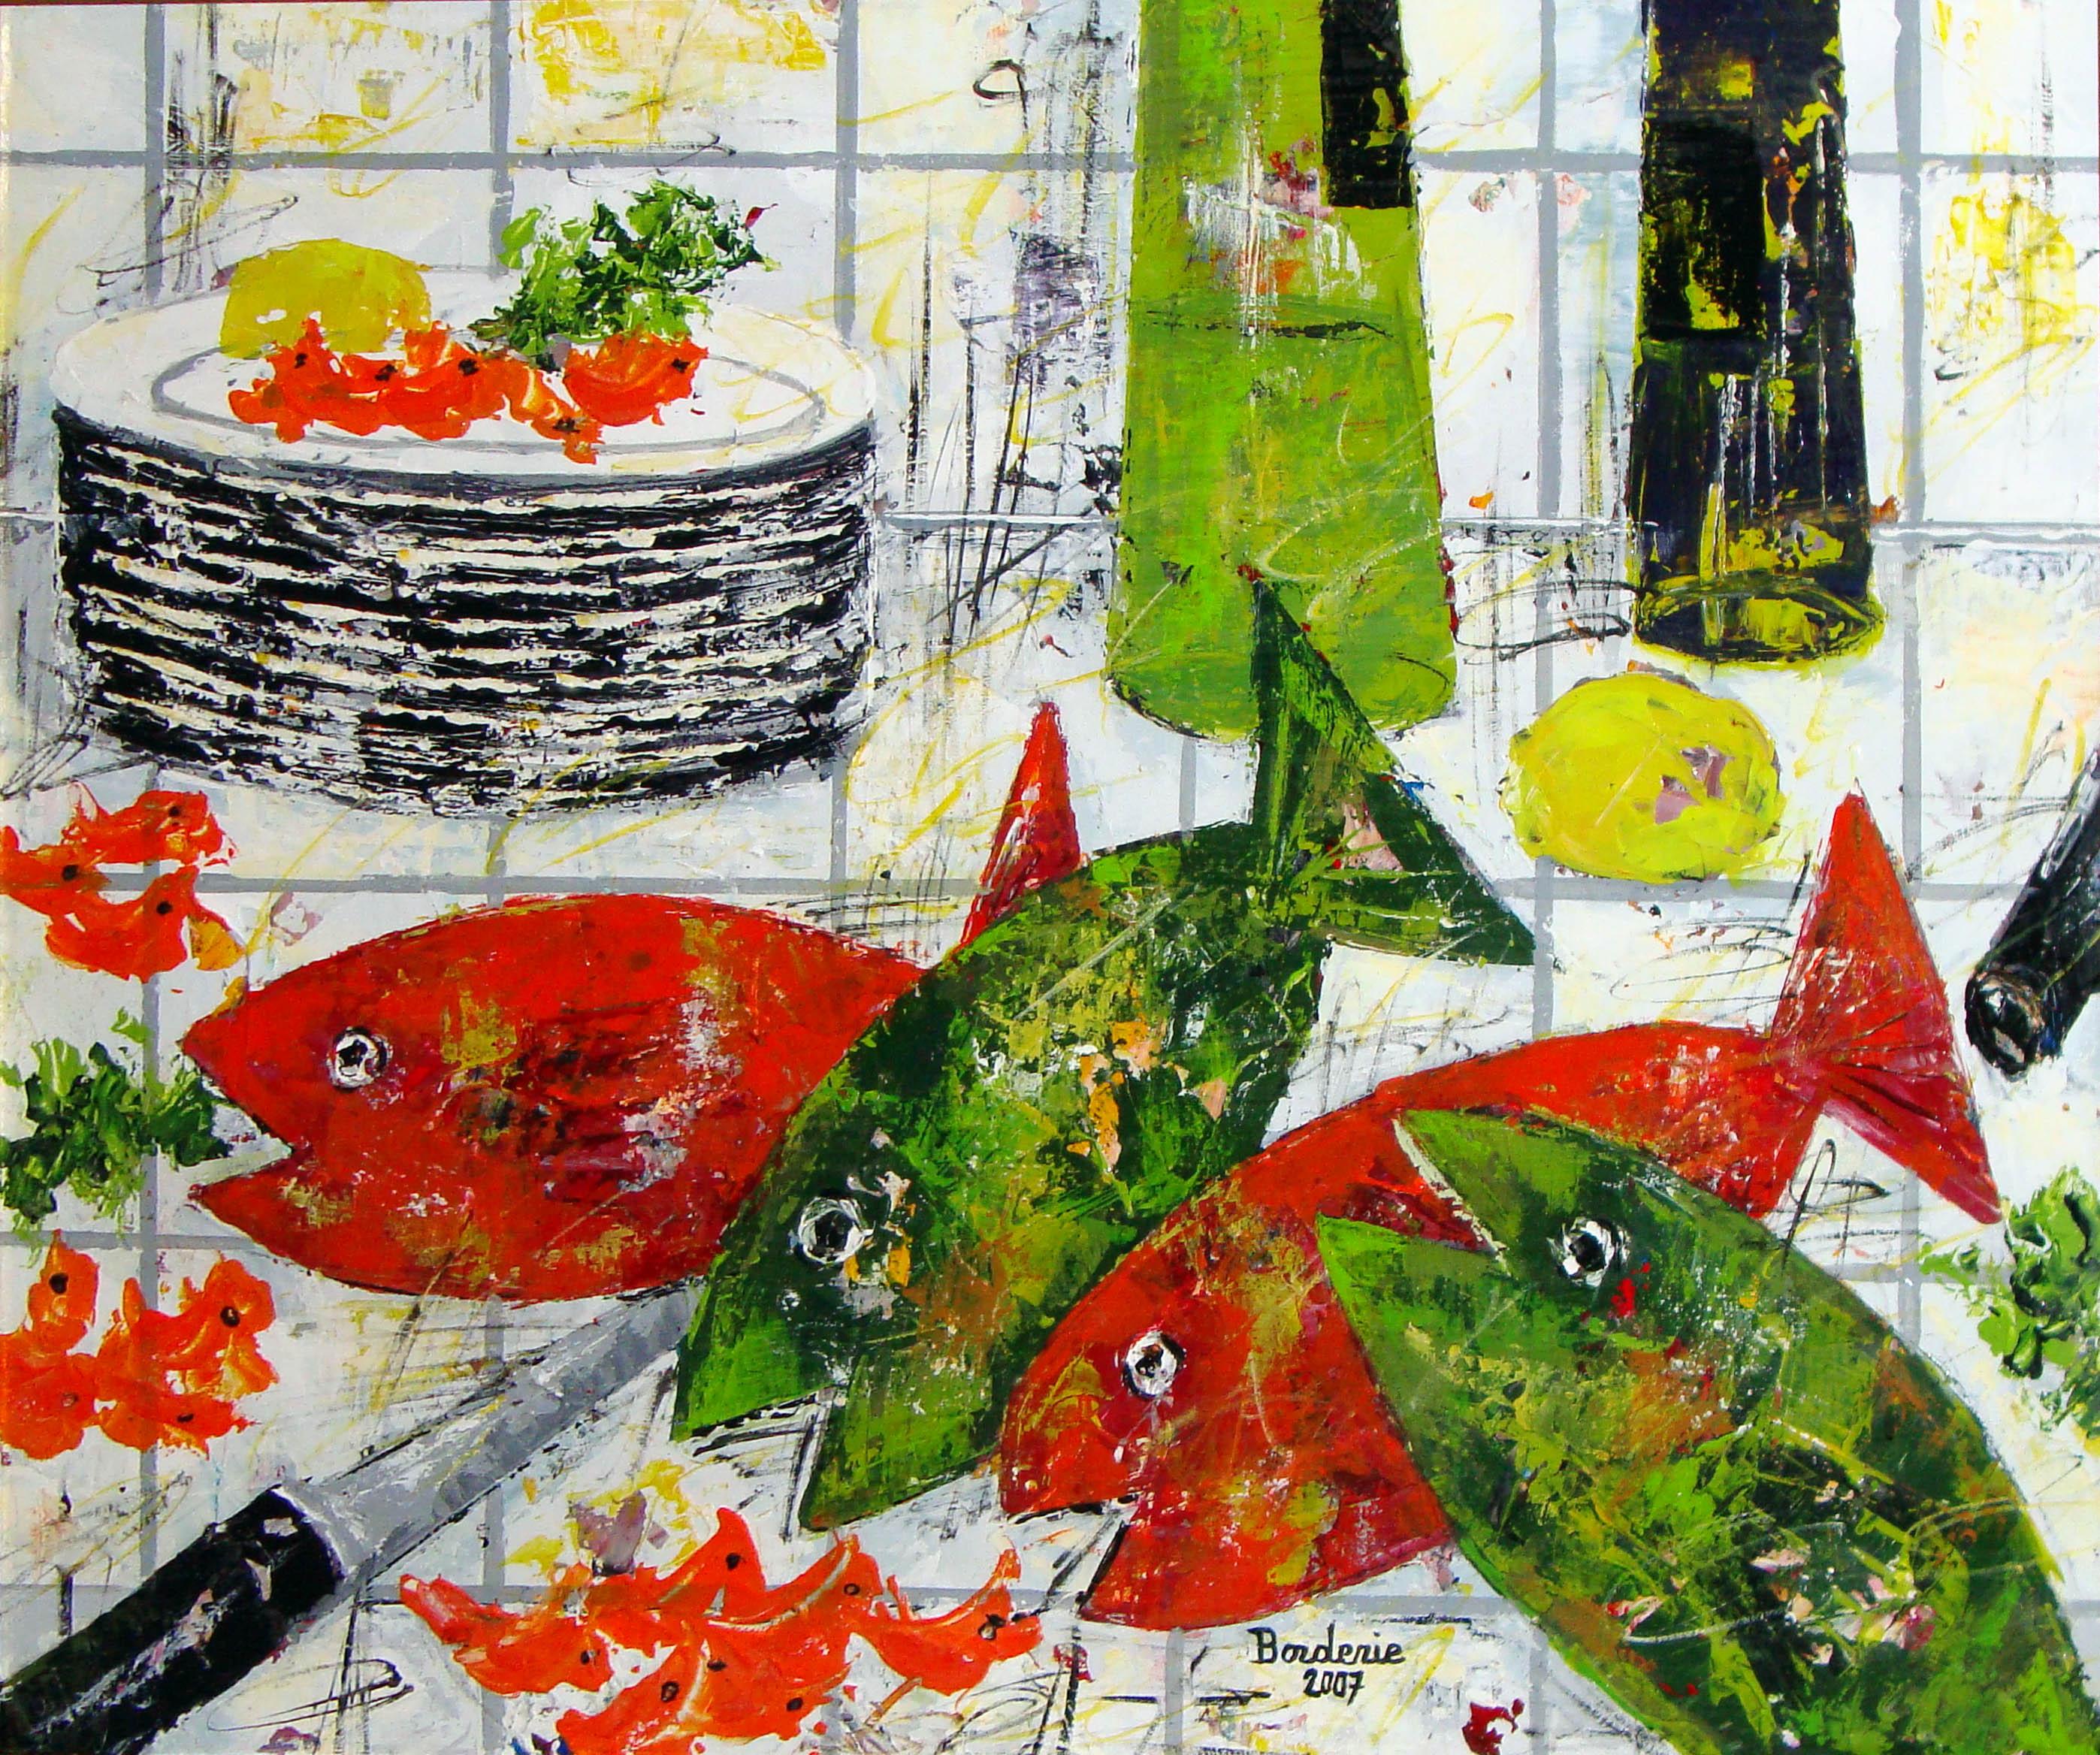 Les quatre poissons